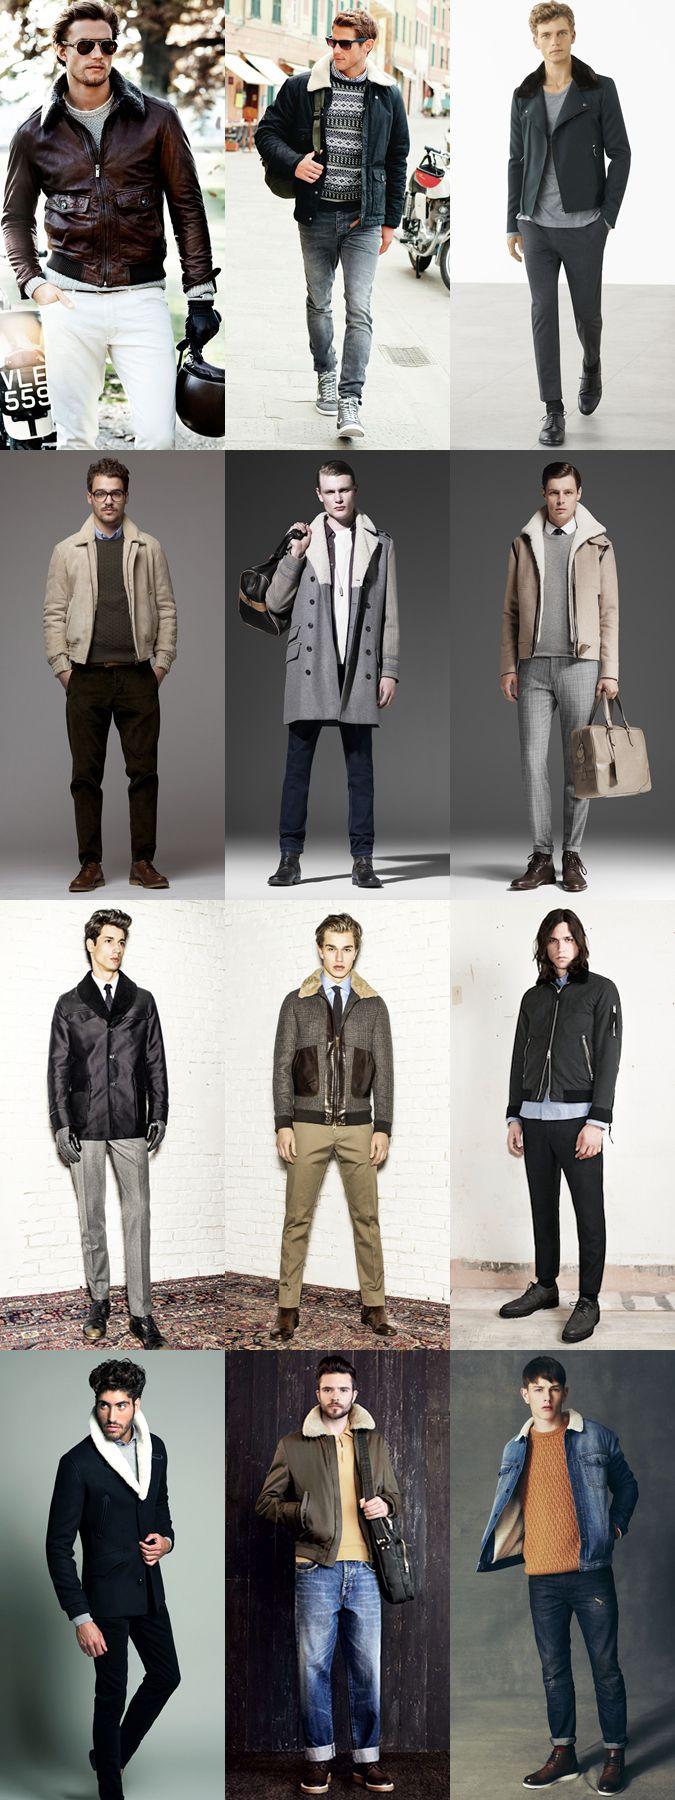 Men's Faux Fur/Borg Collar Jacket Lookbook